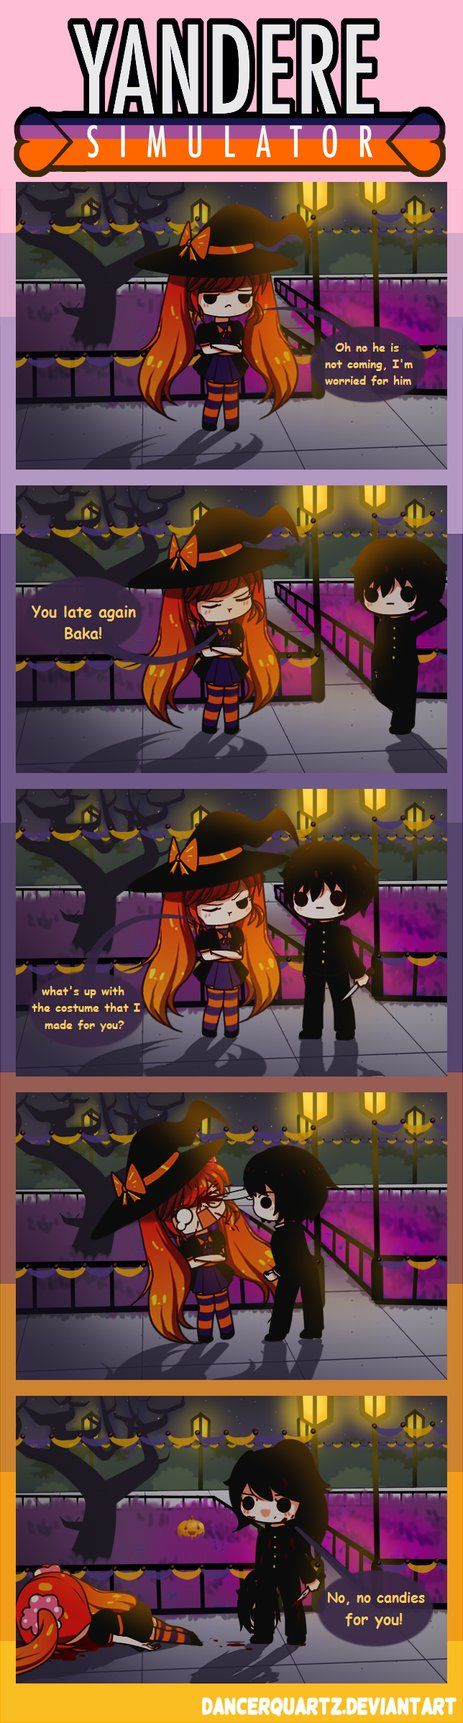 the killer senpai, uoo I'm scared 7-7 Happy Halloween everybody! ---------------------------------ESPAÑOL------------------------------------- Ya sera haloween de nuevo? (°C°)! el a&...